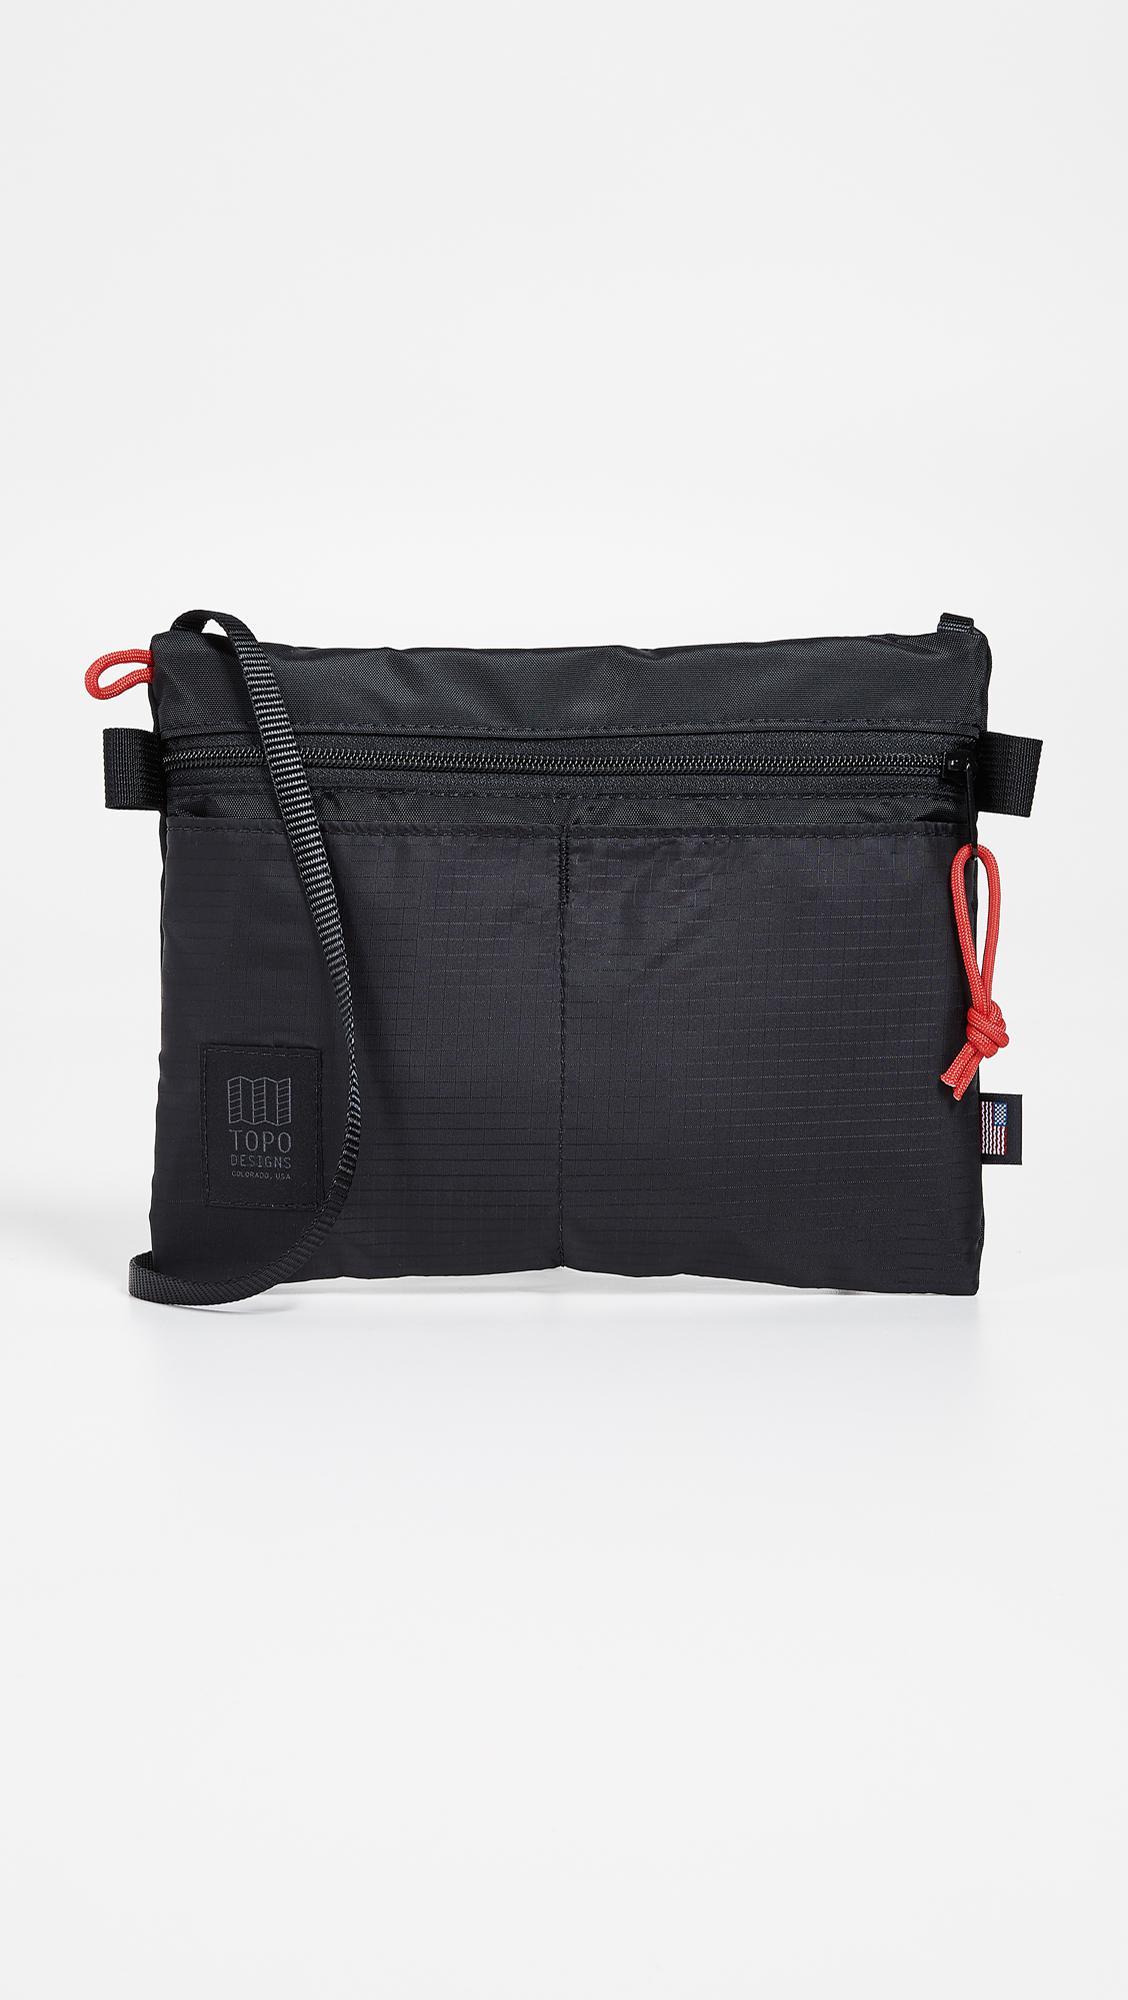 a84b68f0659f Topo Designs Accessory Shoulder Bag in Black for Men - Lyst